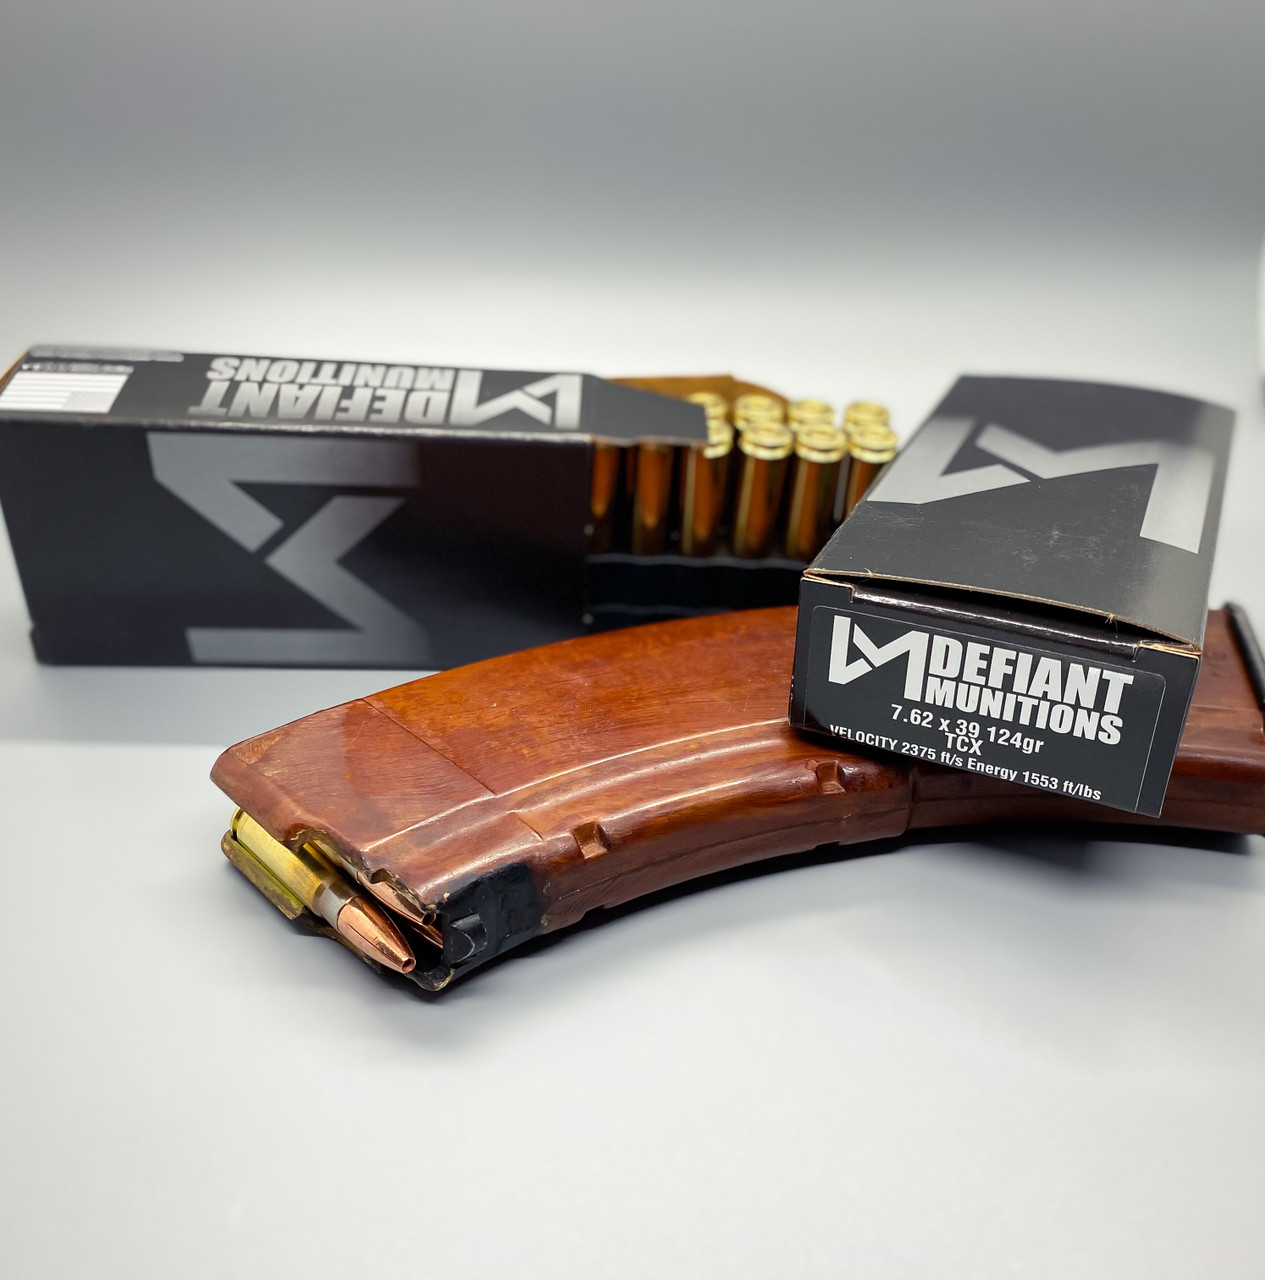 7.62x39 124gr TCX (Total Copper X-panding) Solid Copper Defensive Ammunition